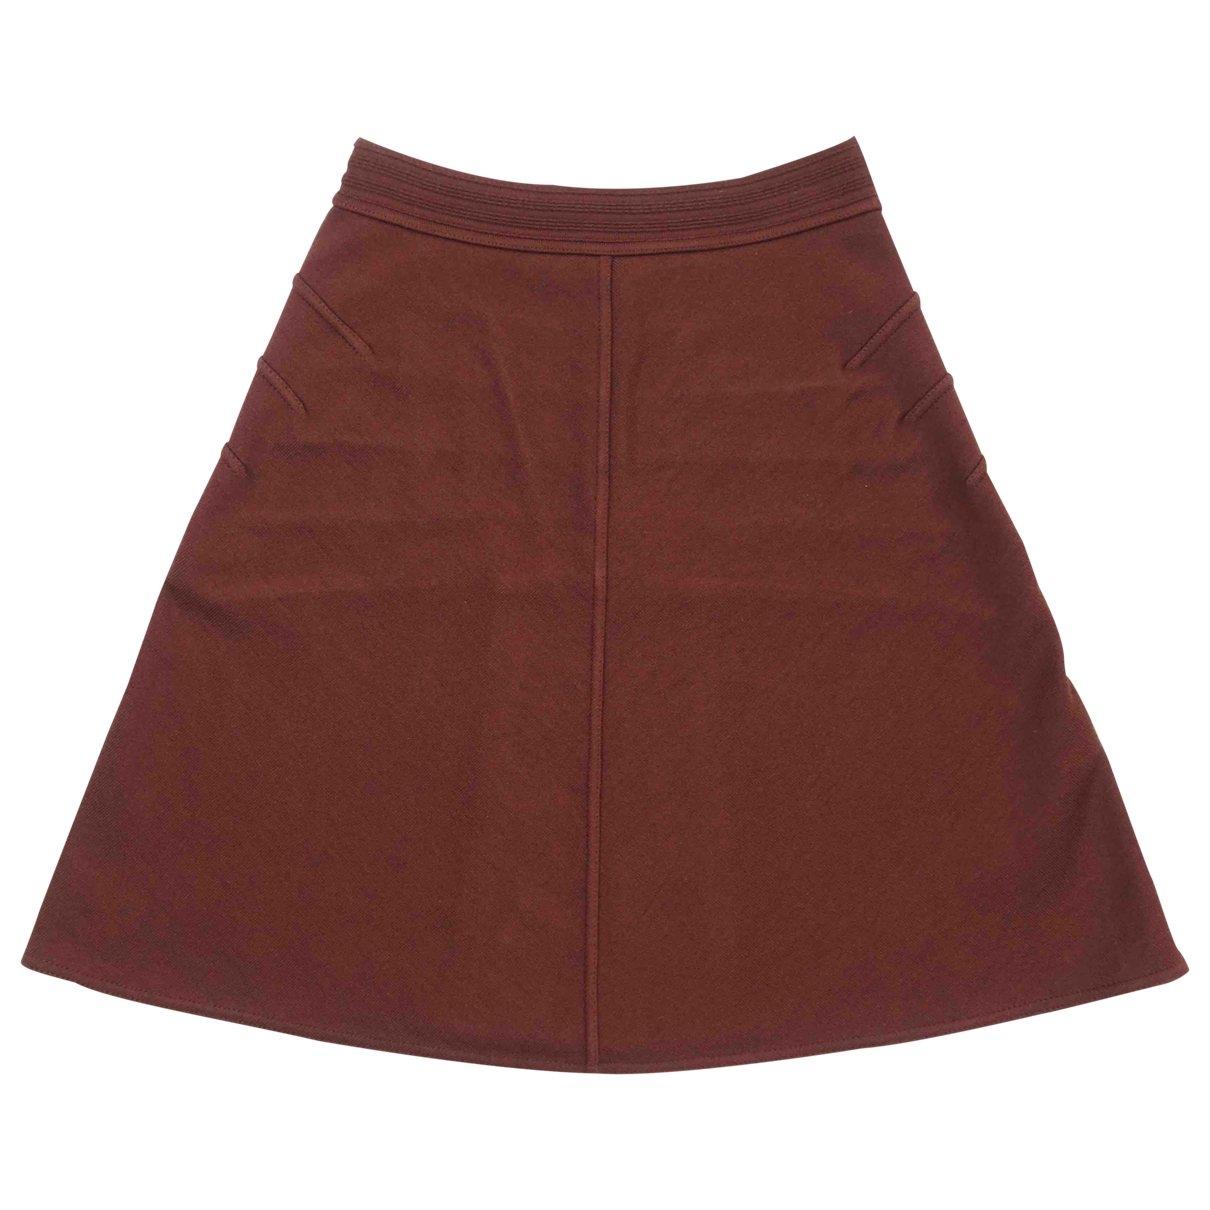 Alaïa \N Brown Wool skirt for Women S International